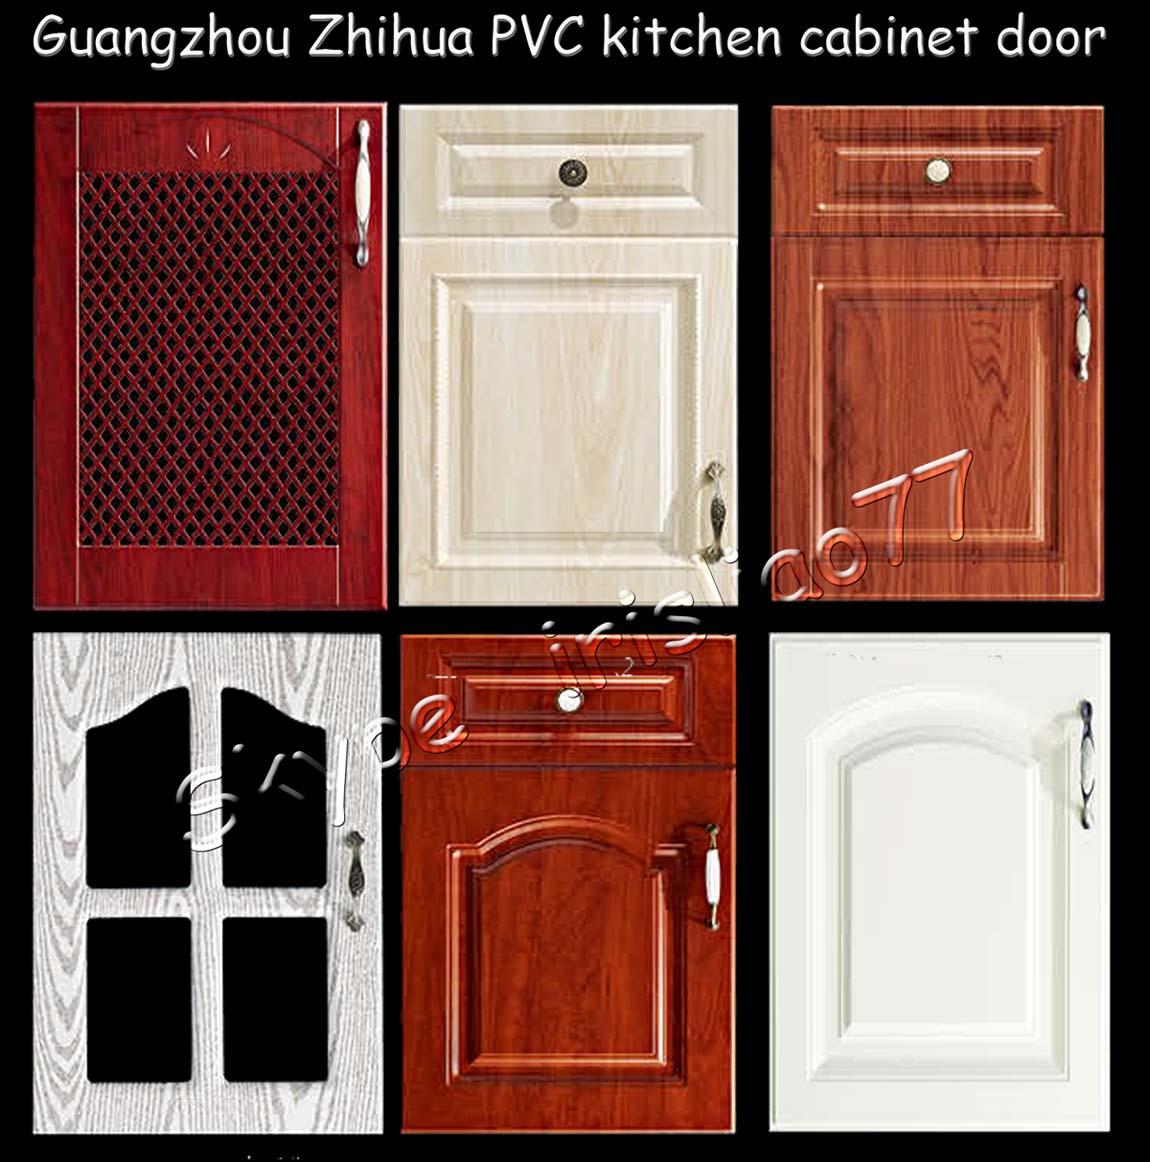 Solid Wood White Pvc Frame Laminate Kitchen Cabinet Door Price Buy Pvc Kitchen Cabinet Door Pvc Kitchen Cabinet Door Price White Pvc Laminate Kitchen Cabinet Door Product On Alibaba Com